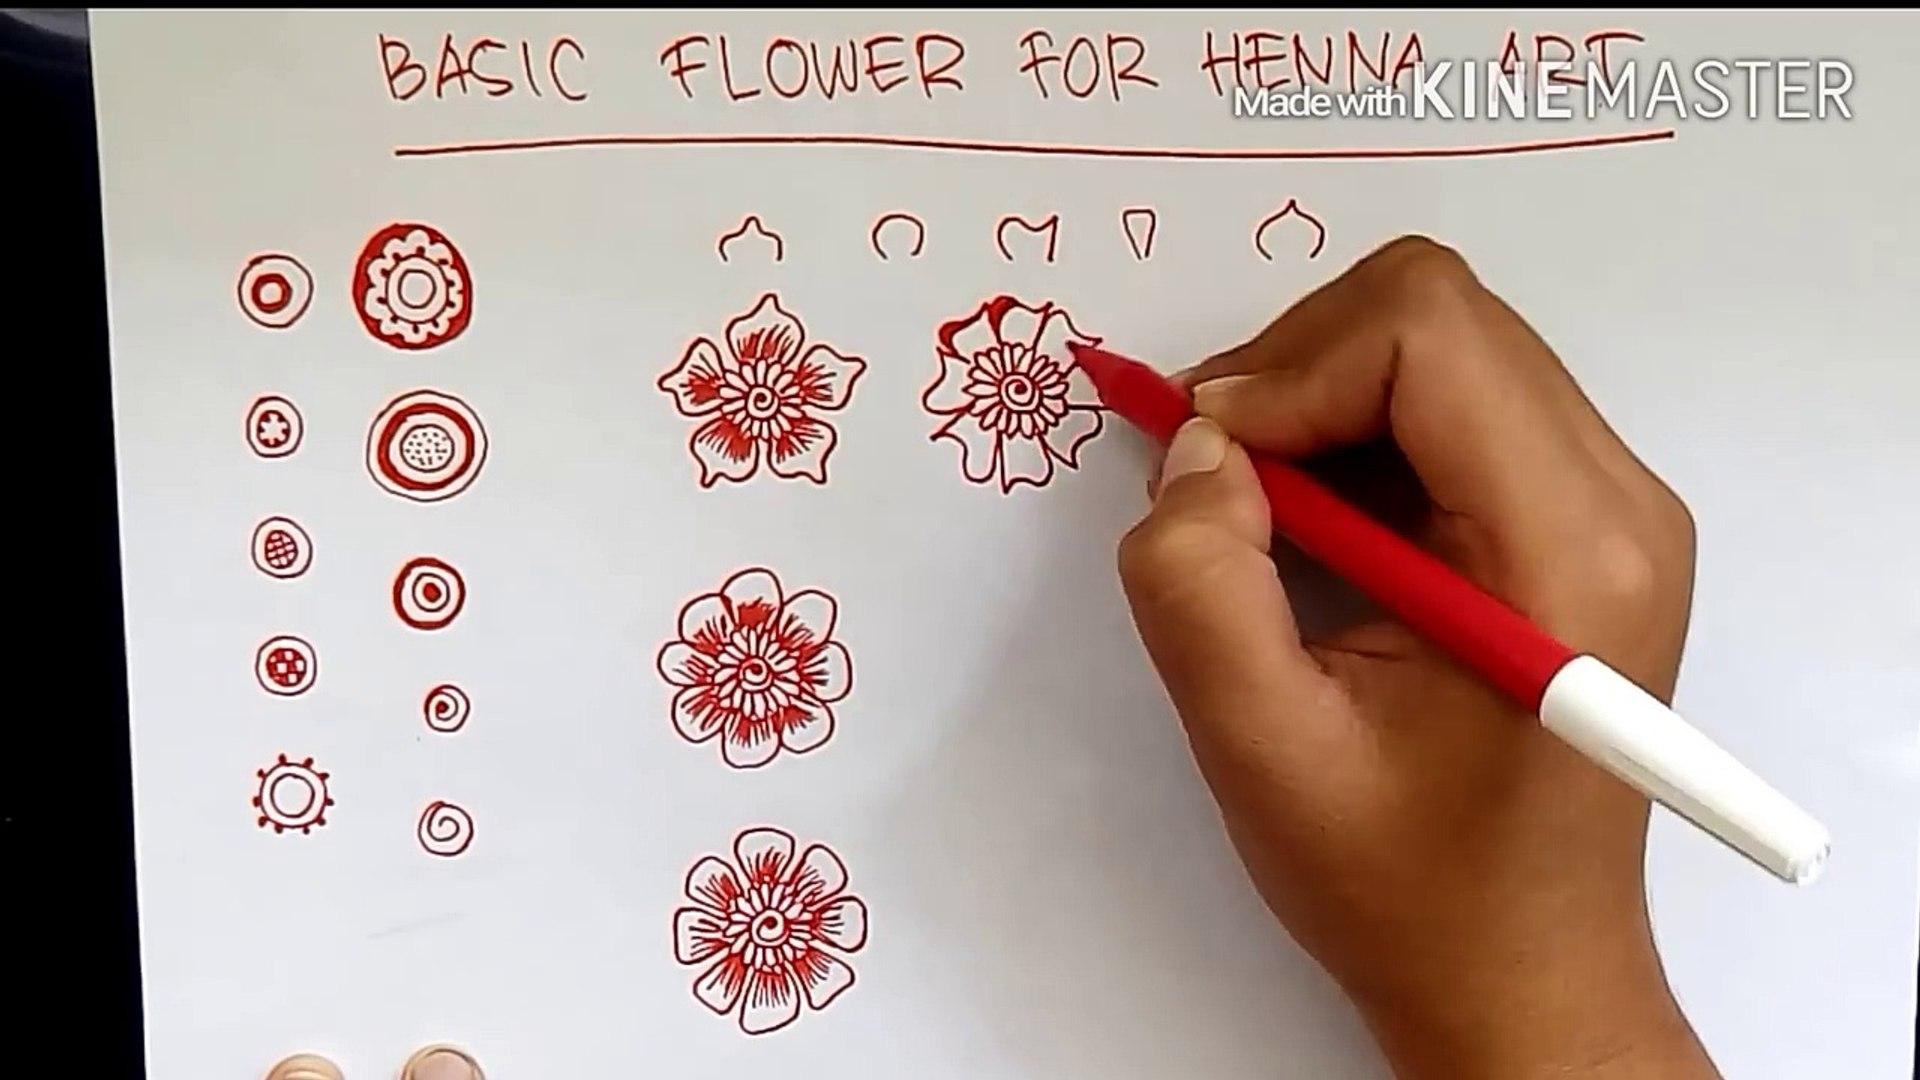 Belajar Henna Untuk Pemula Basic Flower Of Henna Art Video Dailymotion